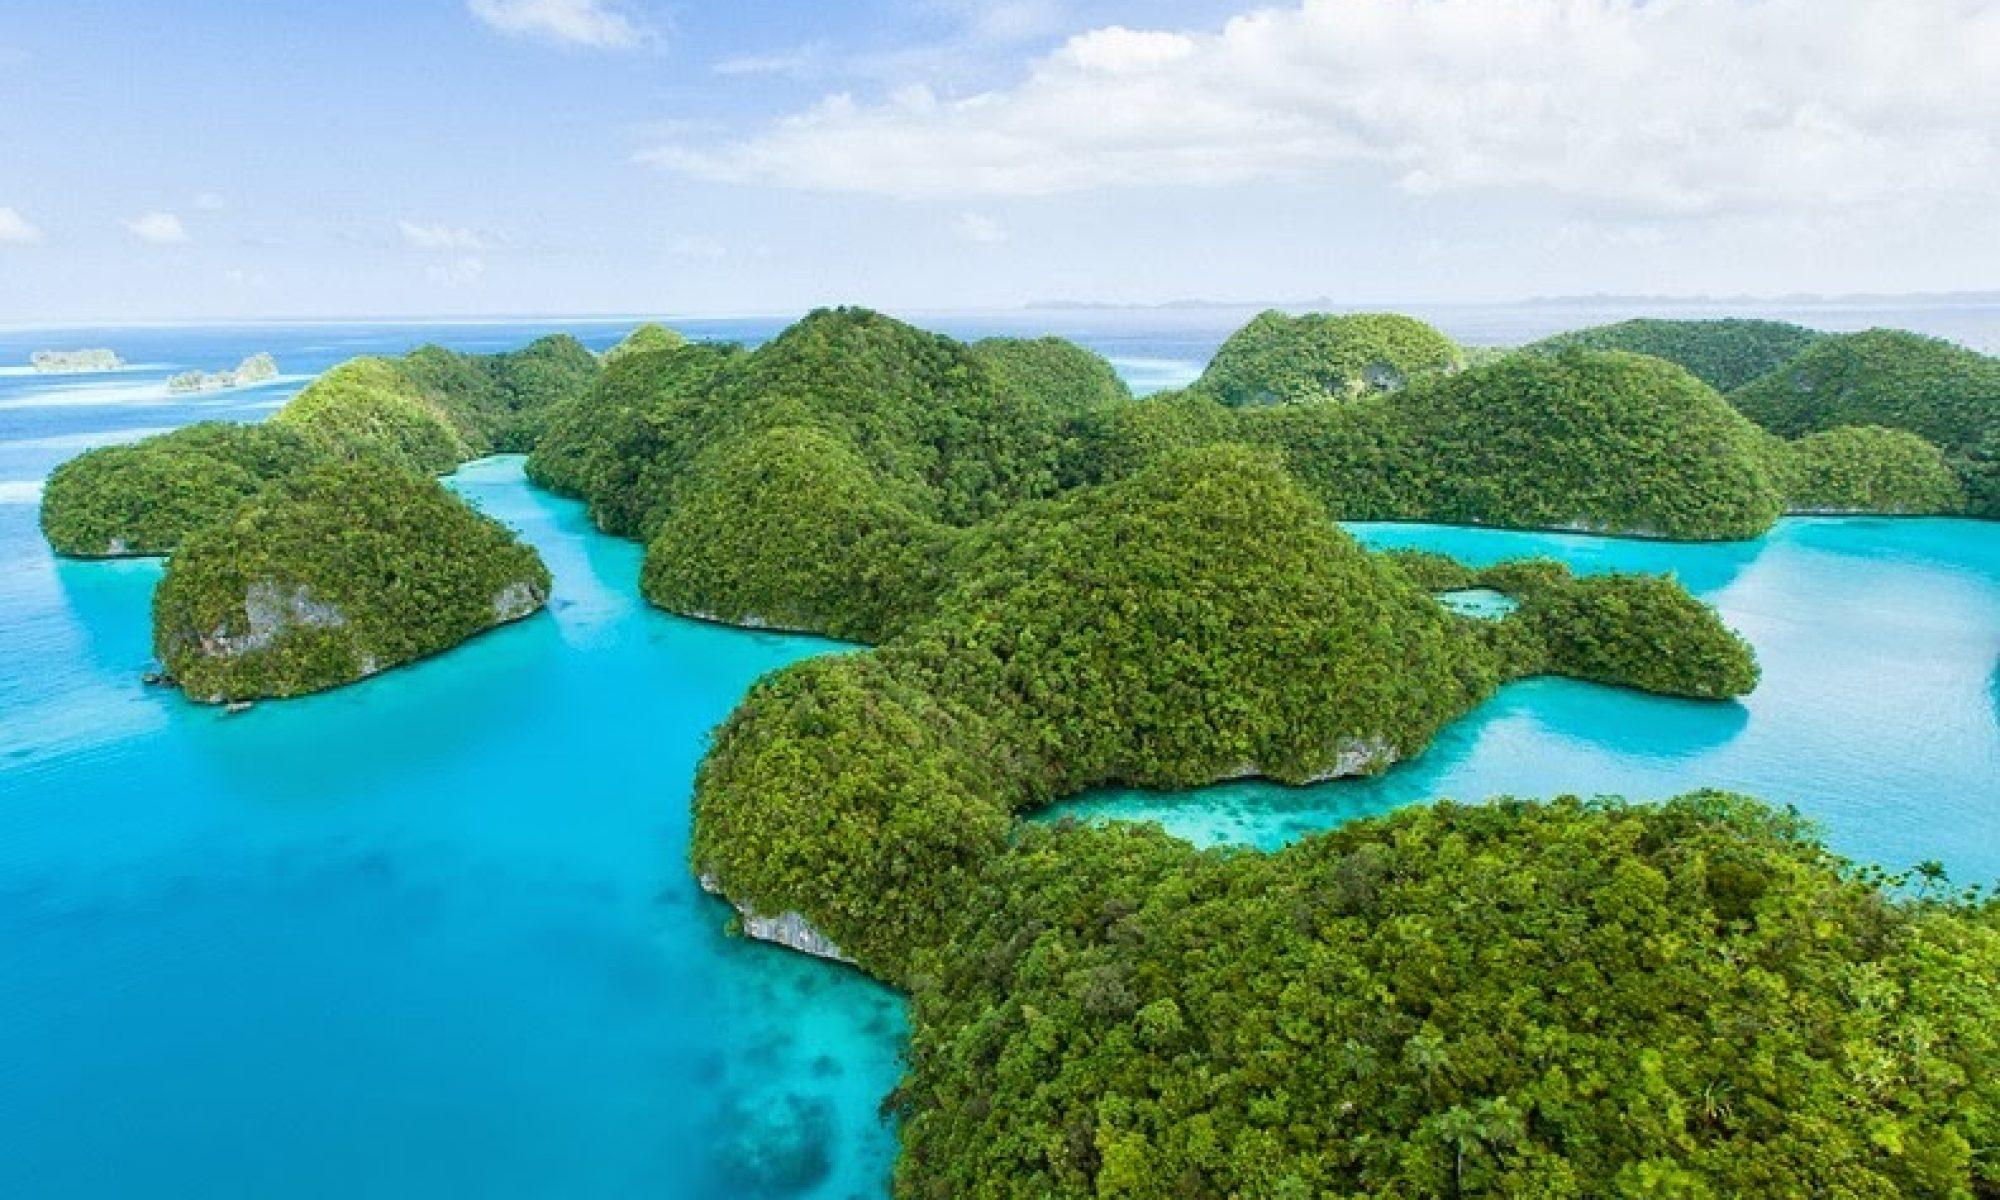 Palau 2018: From Ridge to Reef